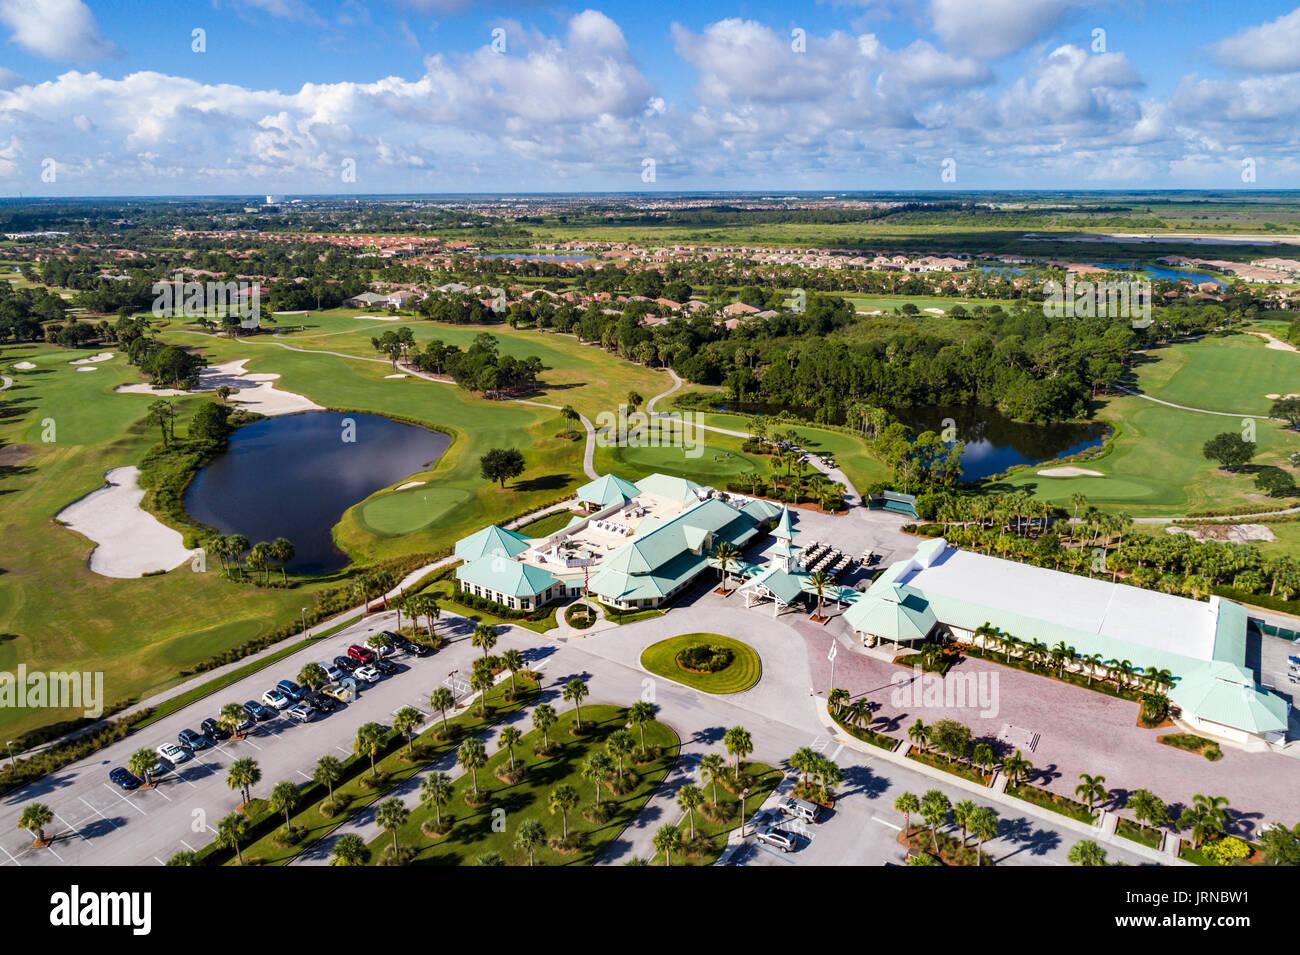 Florida Port Saint St Lucie West PGA Golf Club clubhouse course aerial overhead bird's eye view above bird's eye above - Stock Image